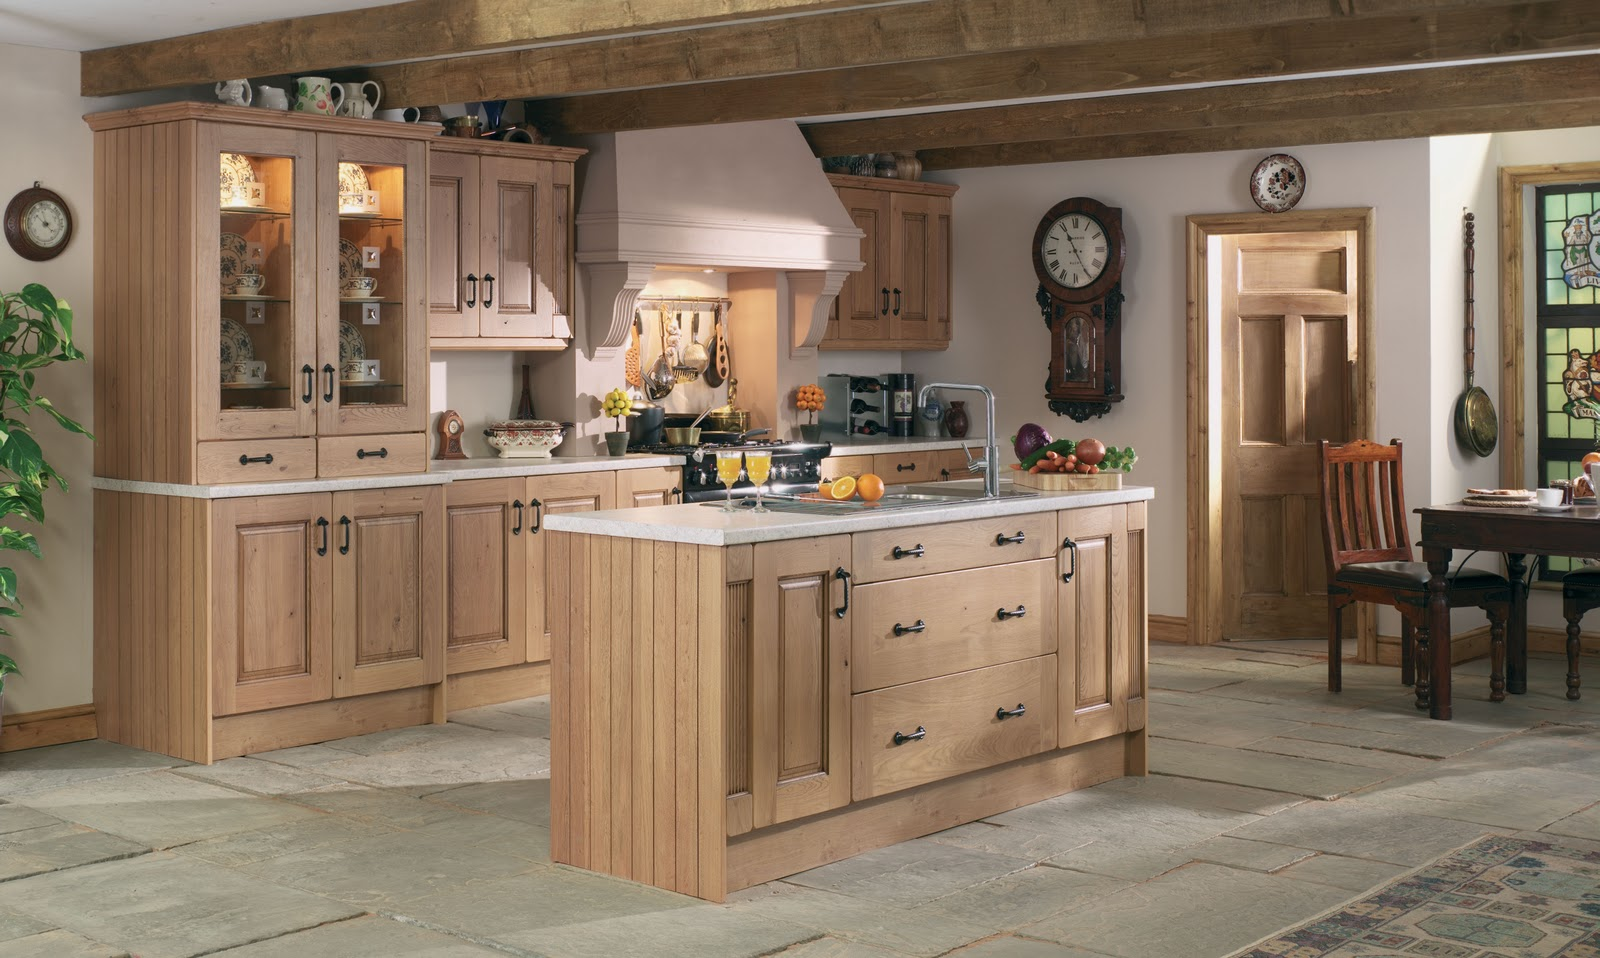 Magnificent Traditional Kitchen Design Ideas 1600 x 958 · 270 kB · jpeg